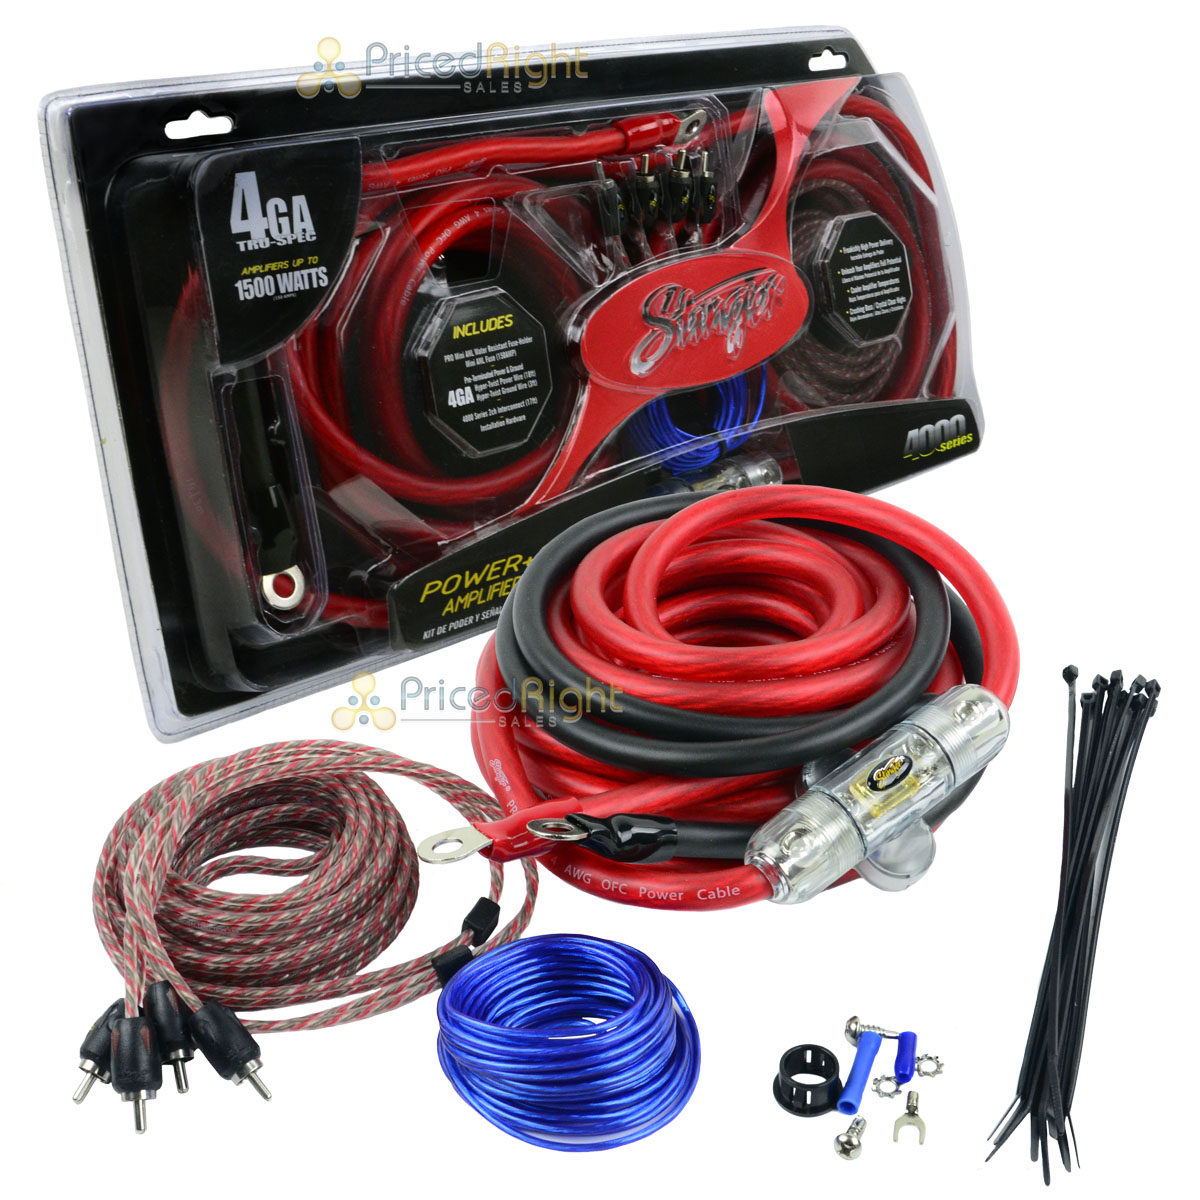 stinger true 4 gauge amp kit ofc 1500 watts power signal amplifier rh ebay com